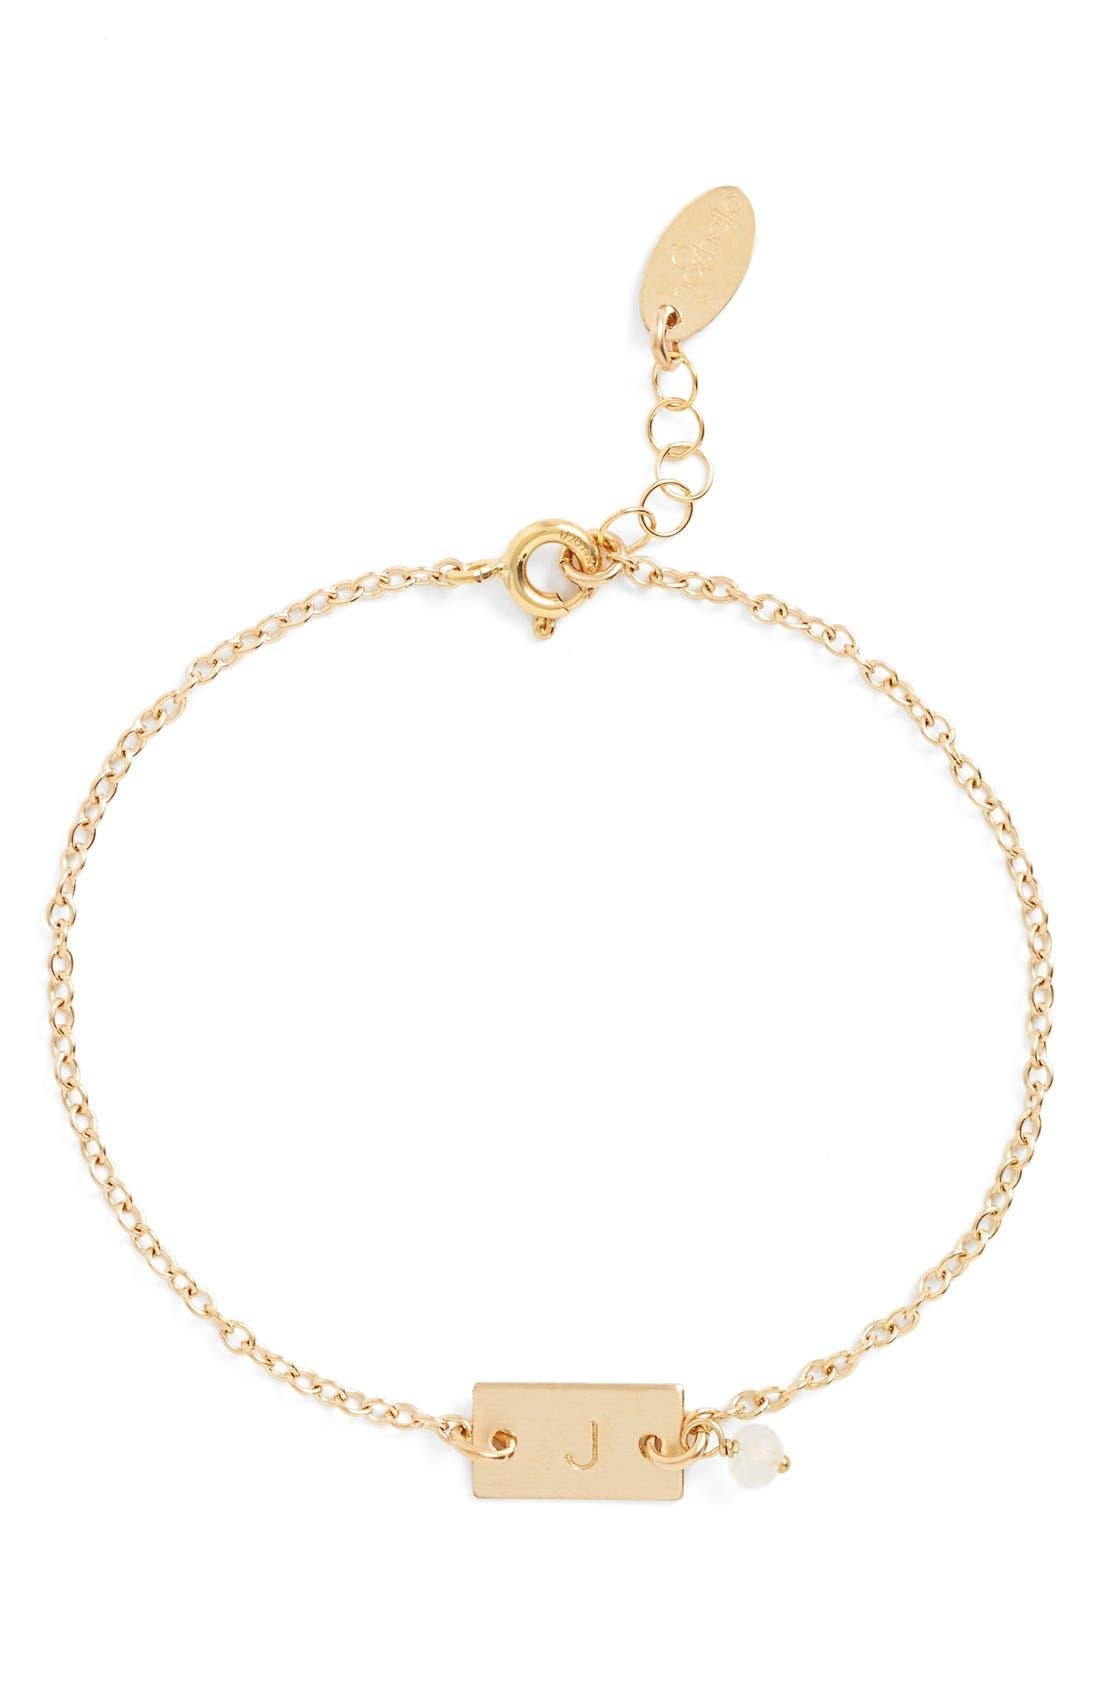 Shaka Initial 14k-Gold Fill Bar Bracelet,                         Main,                         color, 14K Gold Fill J